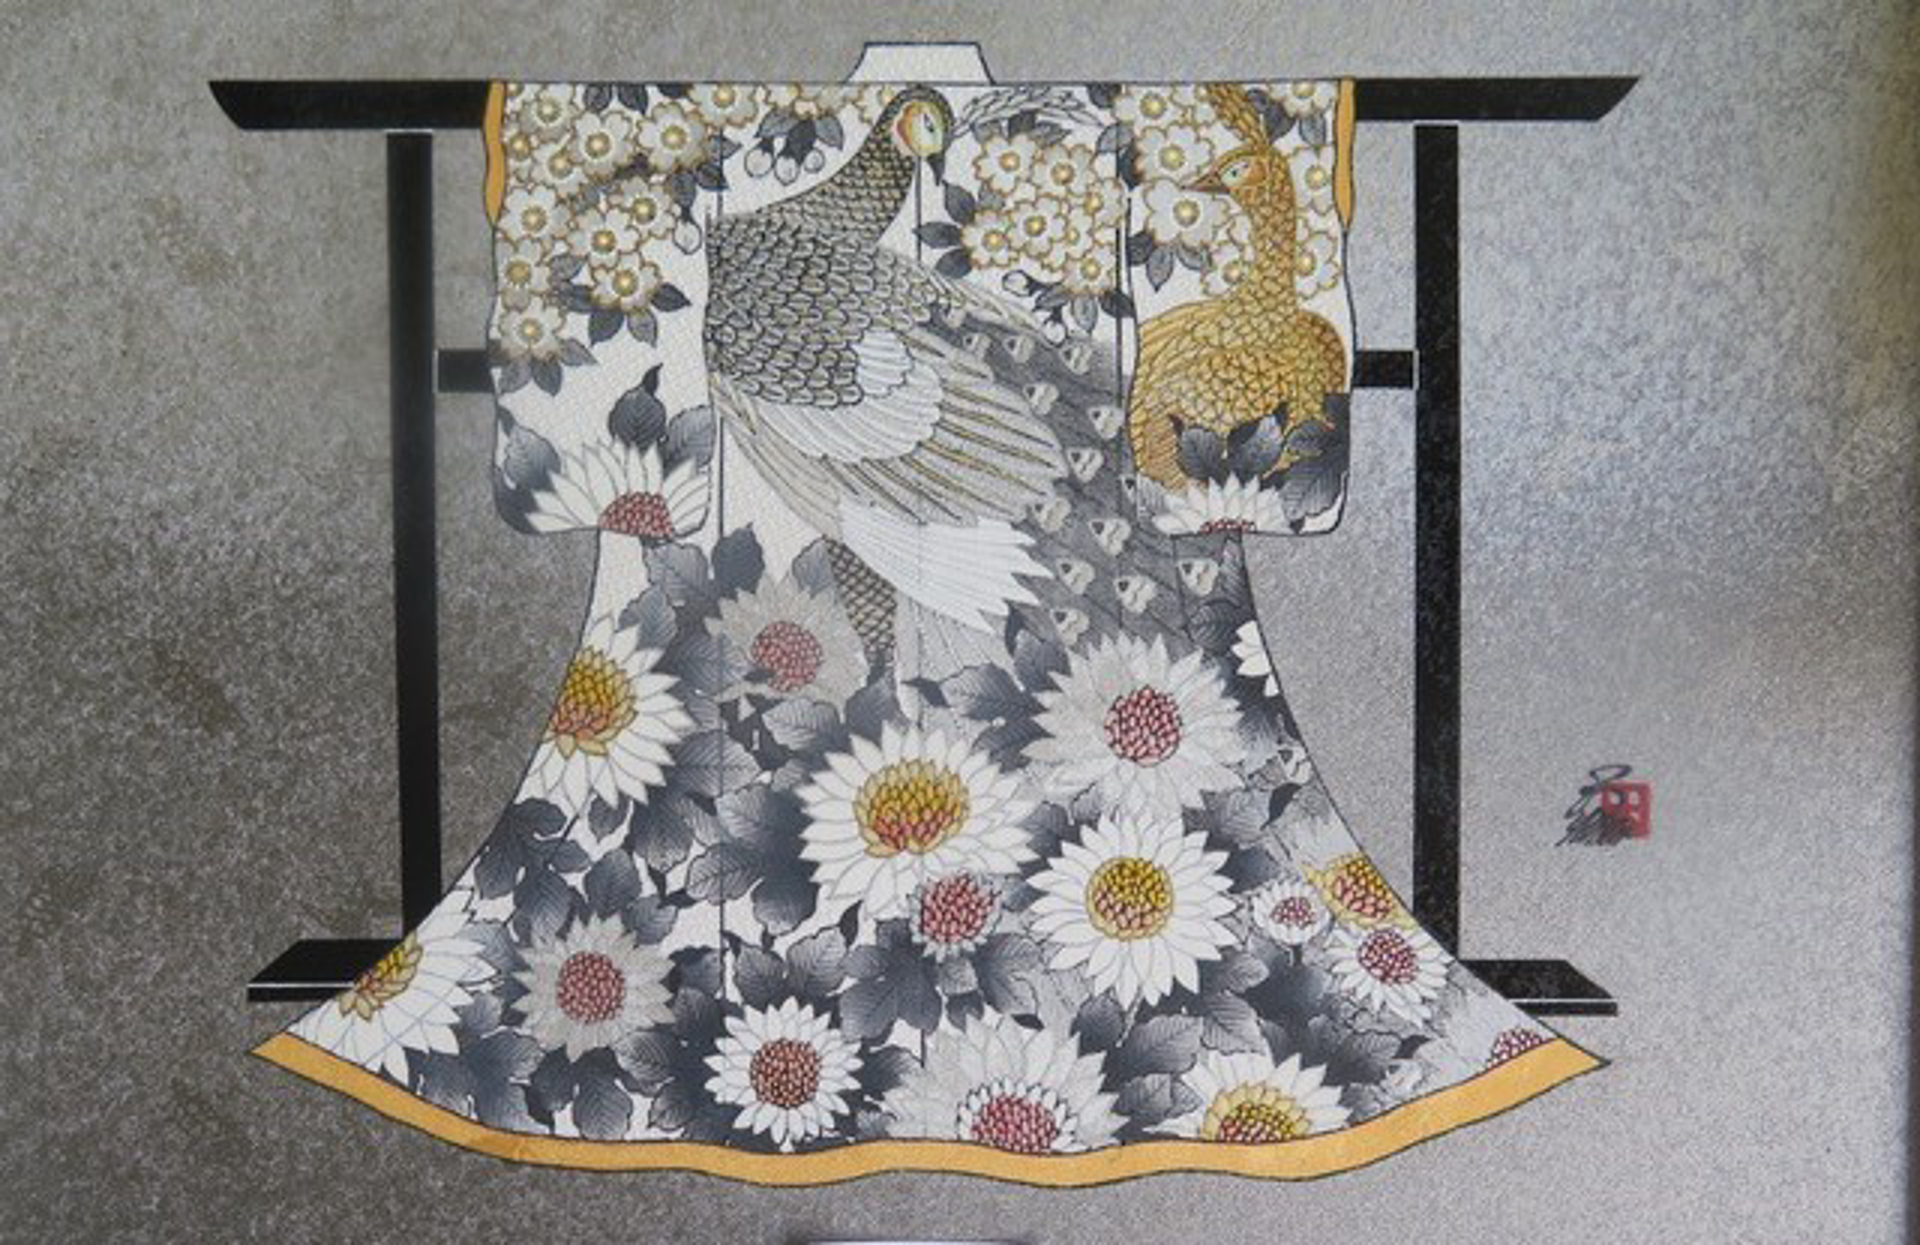 NATURE'S KEEPER #11 (Mini Kimono) by Hisashi Otsuka